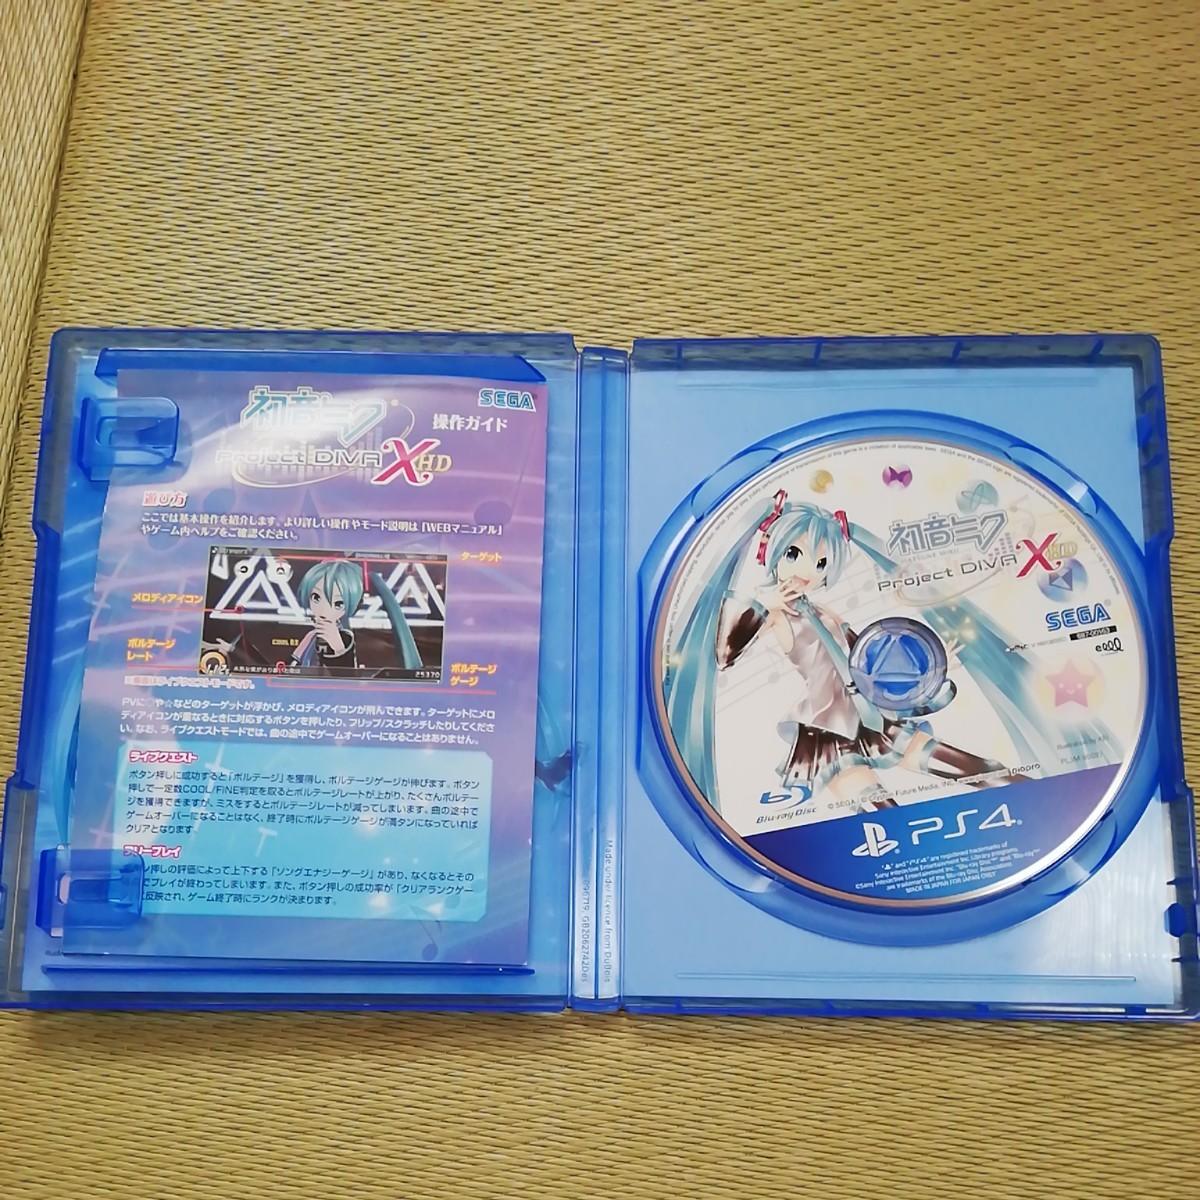 PS4 初音ミクProject DIVA X HD